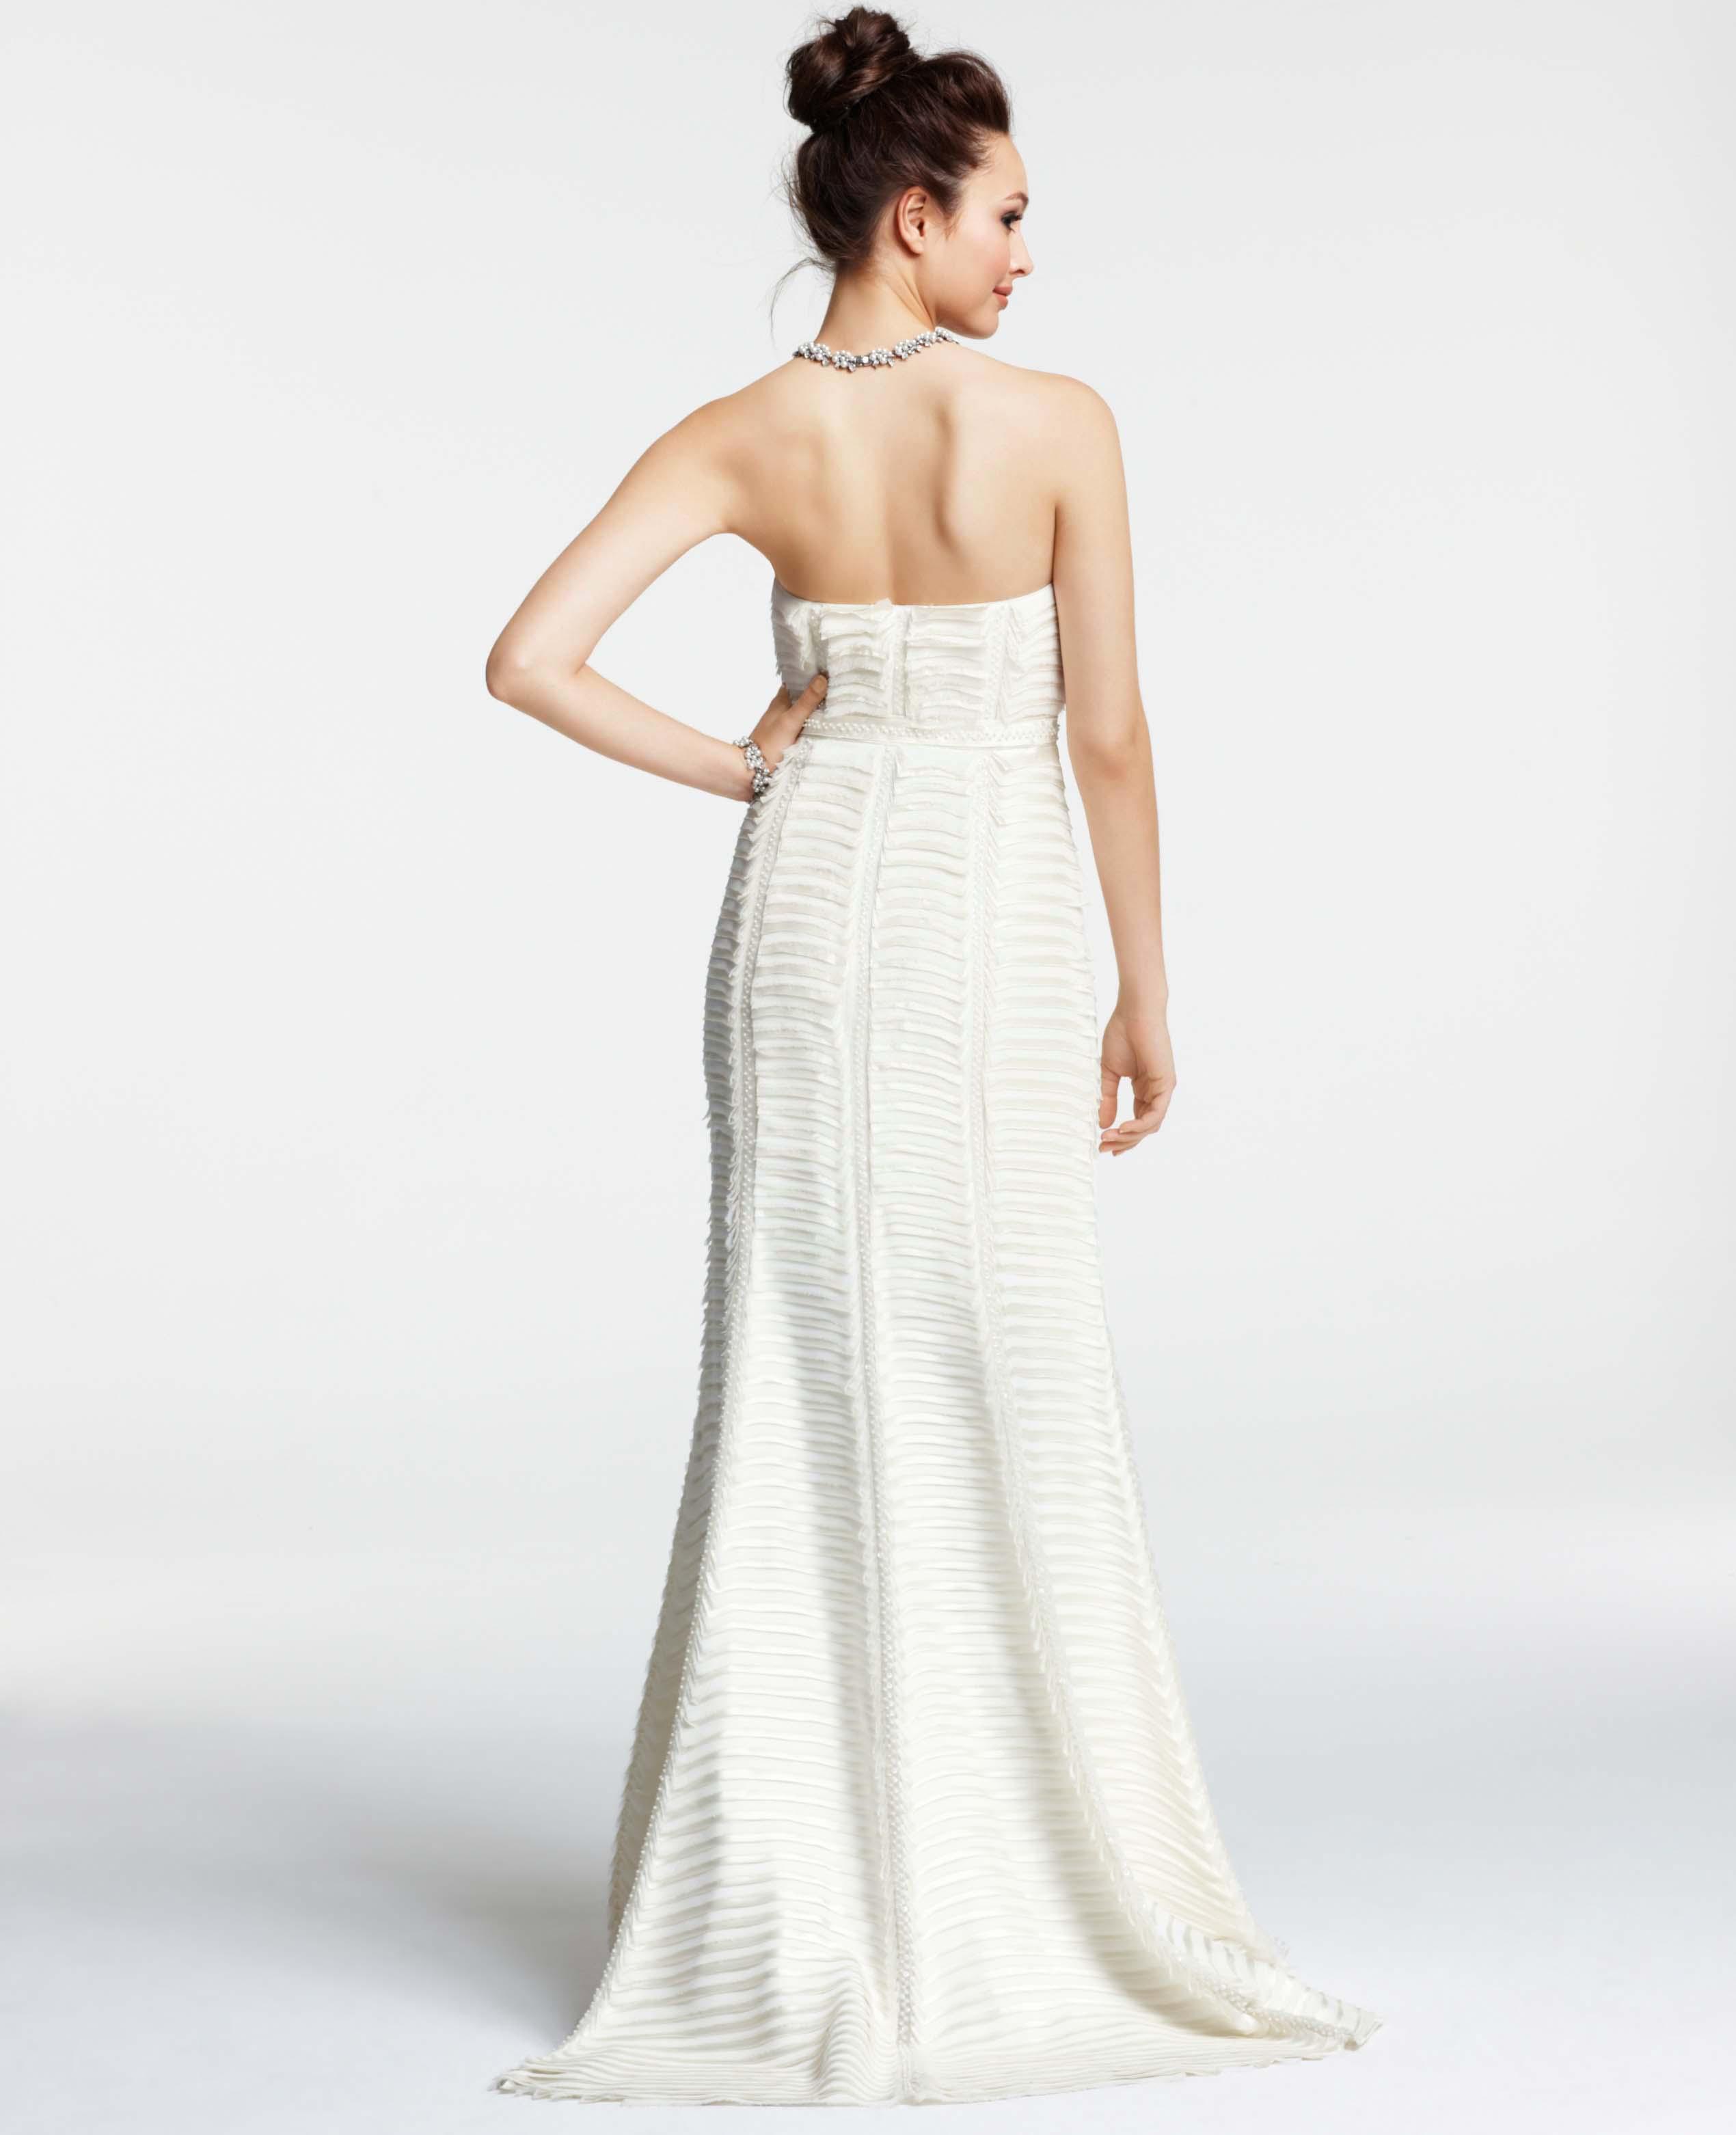 Ann taylor silk charmeuse tiered strapless wedding dress in white gallery junglespirit Choice Image